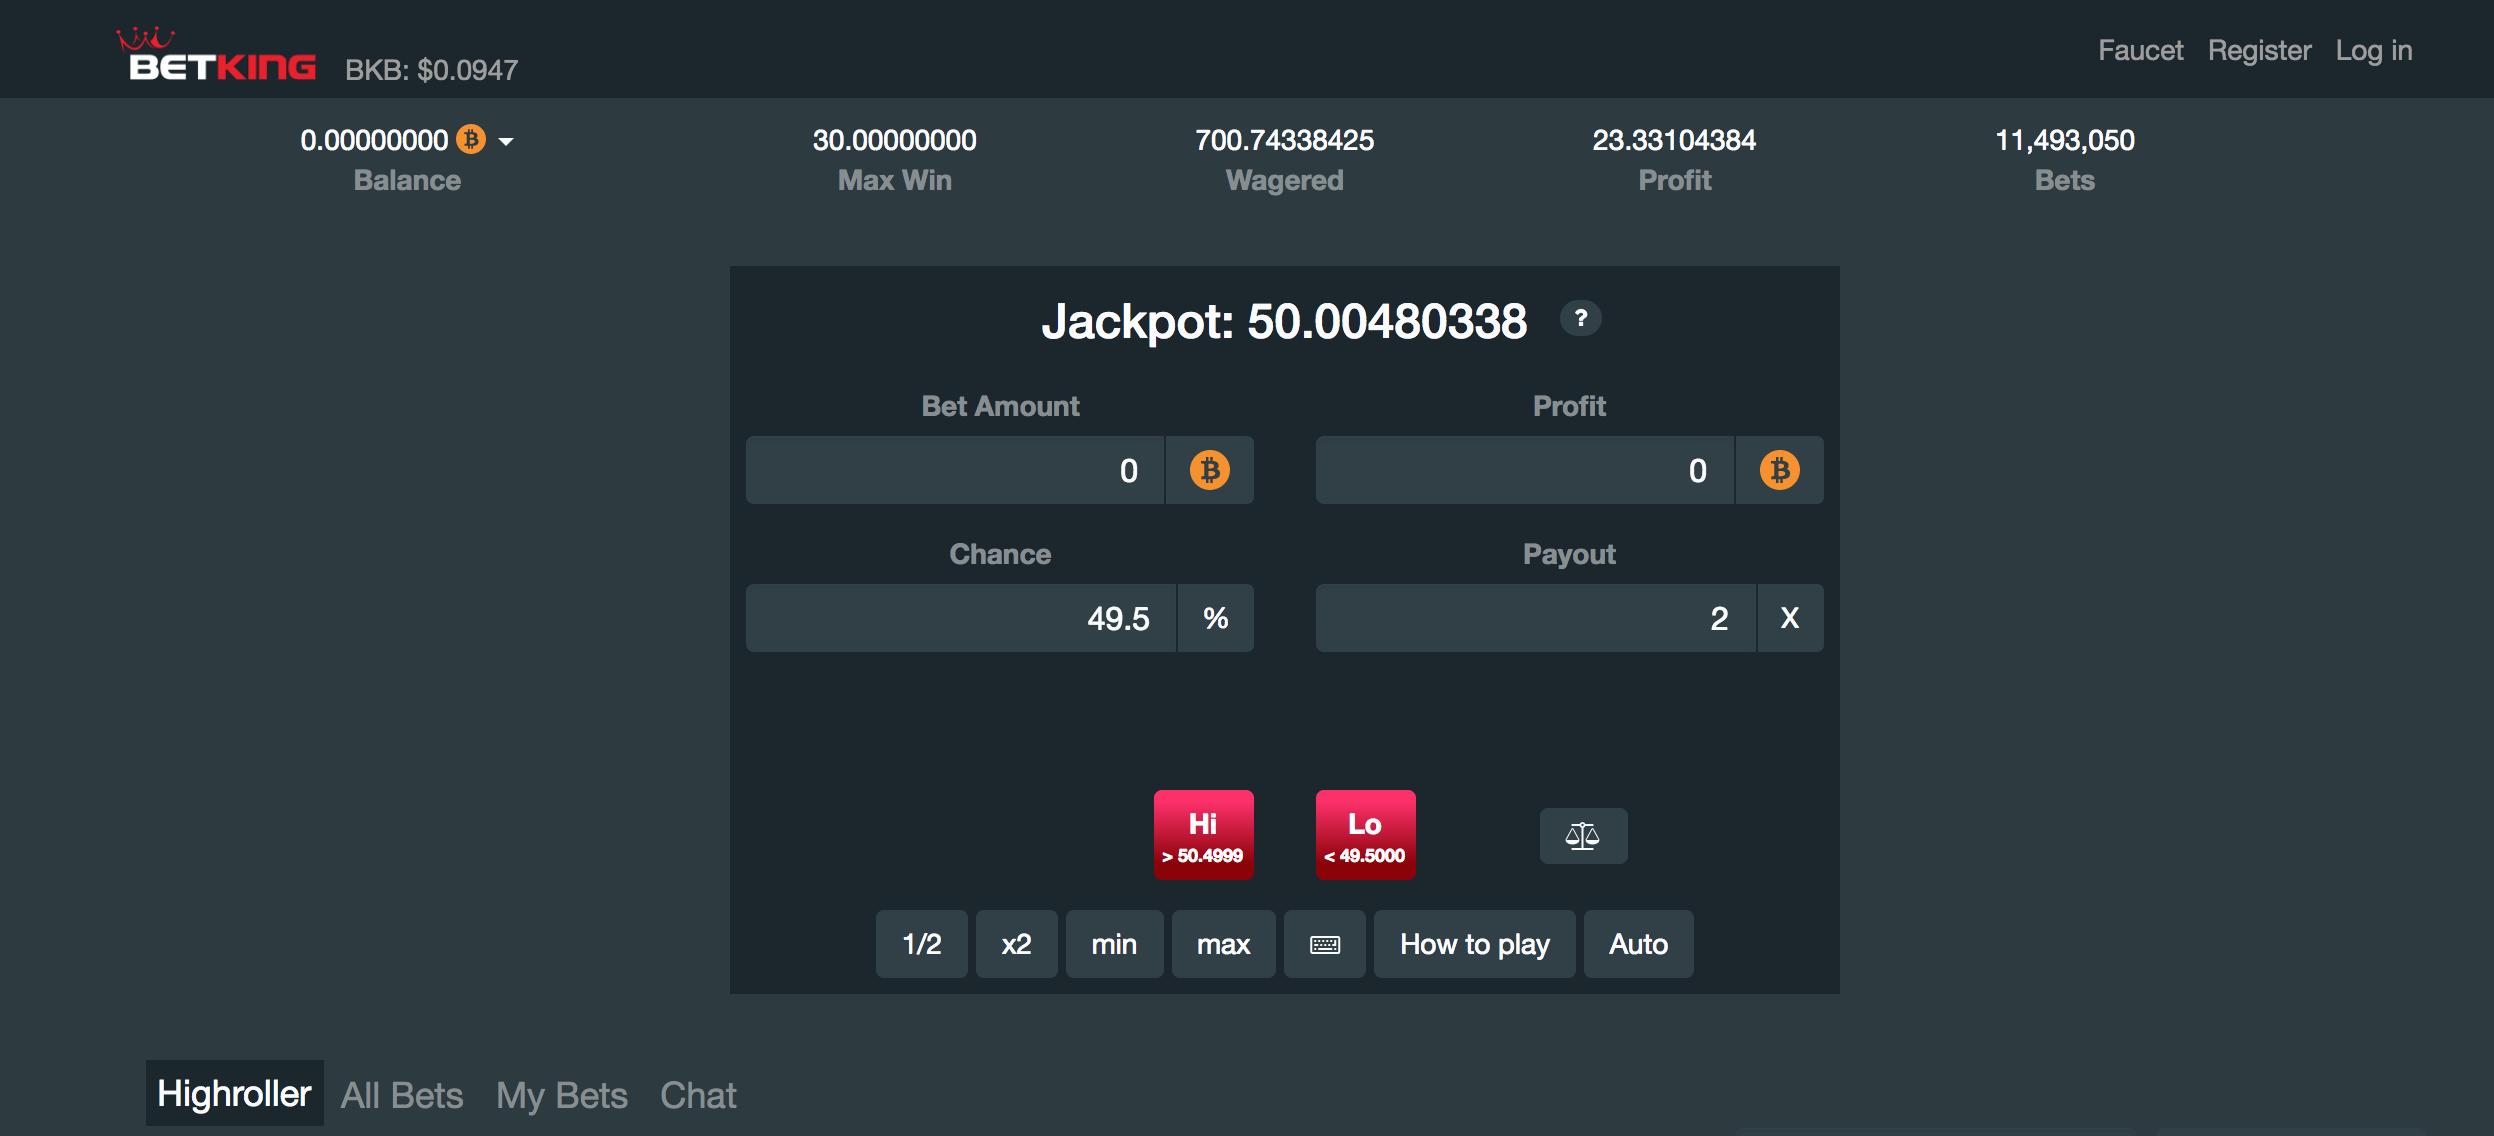 Bitcoin dice betting bitit earn bitcoins for free apk downloads